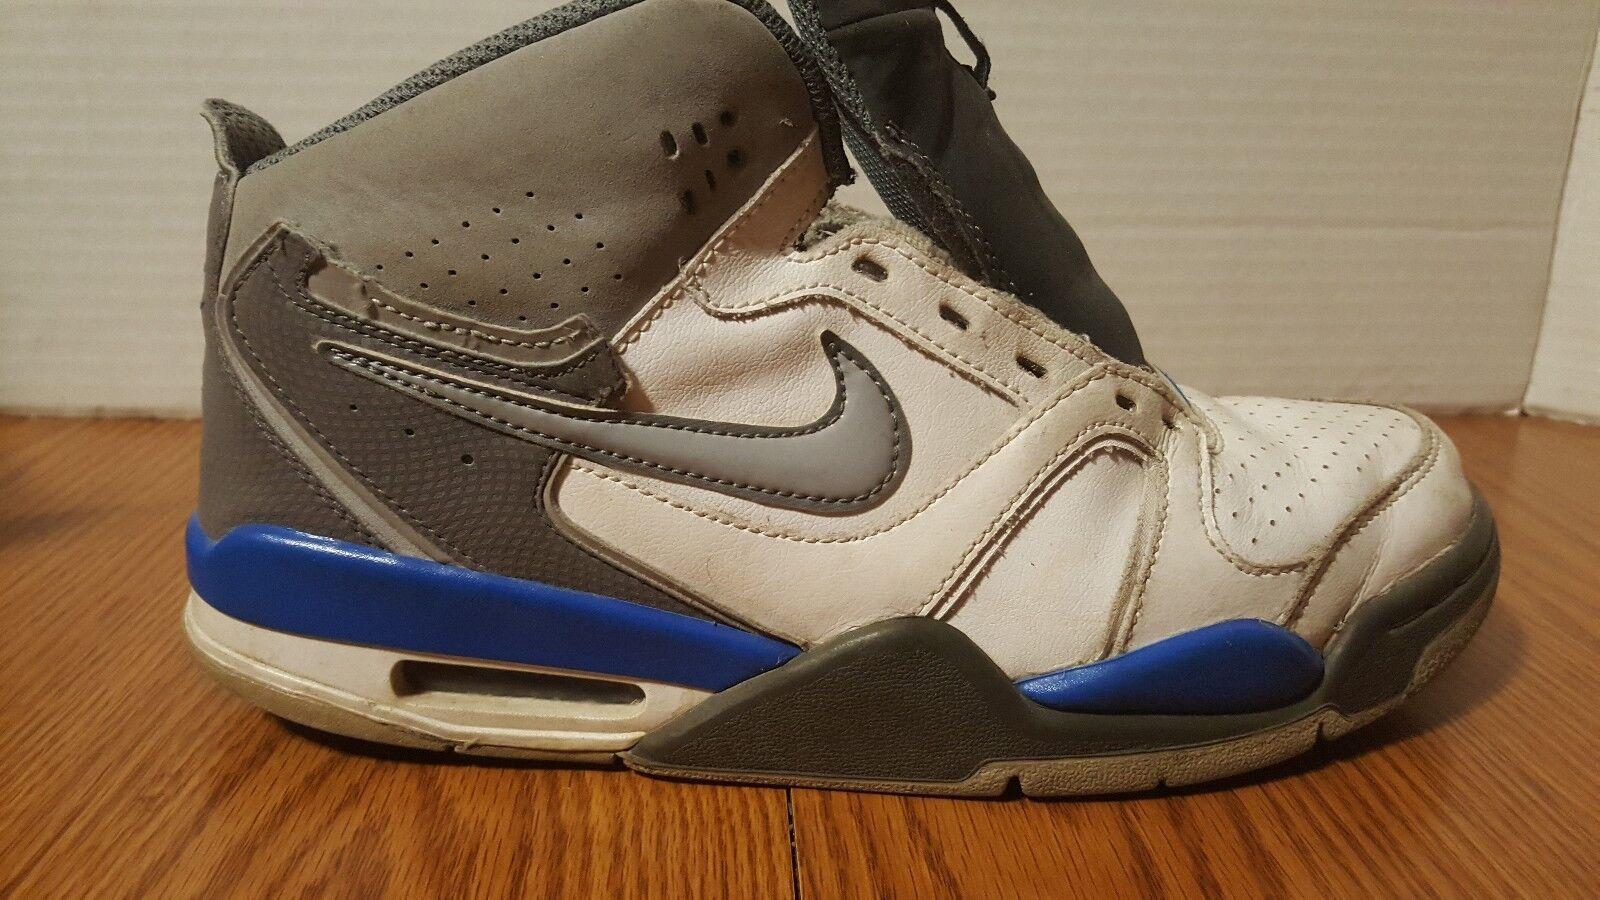 nike nike nike air volo scarpe da basket 8 | Grande vendita  | Uomo/Donna Scarpa  53fd0f